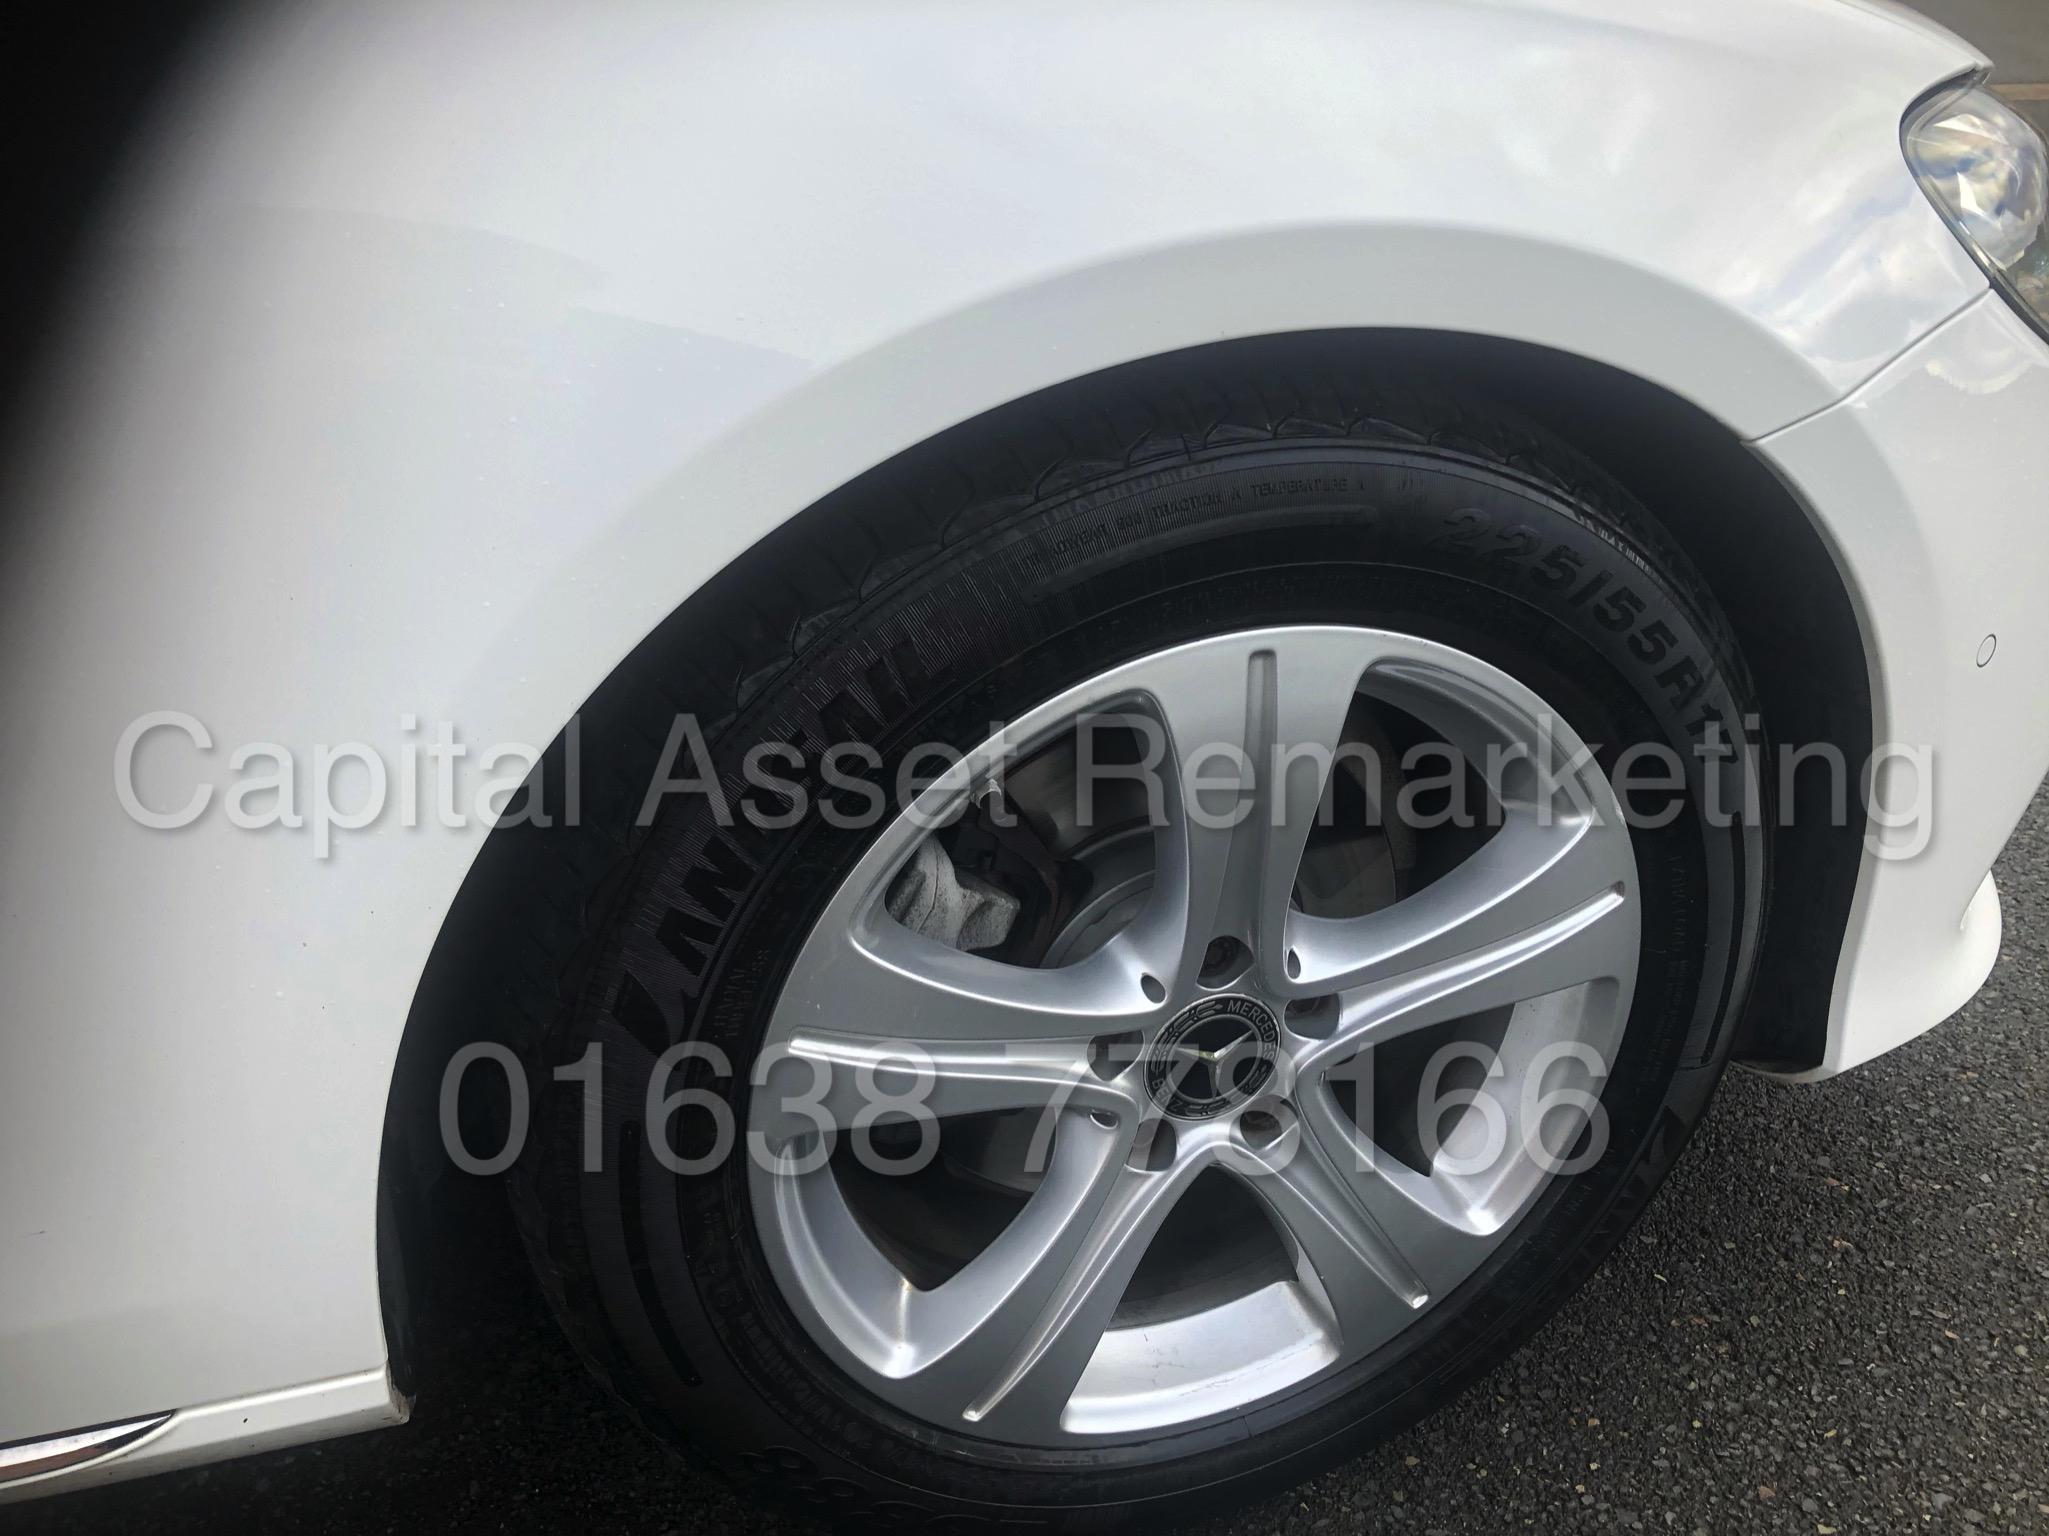 MERCEDES-BENZ E220D *SALOON* (2018 - NEW MODEL) '9-G TRONIC AUTO - LEATHER - SAT NAV' *HUGE SPEC* - Image 9 of 20